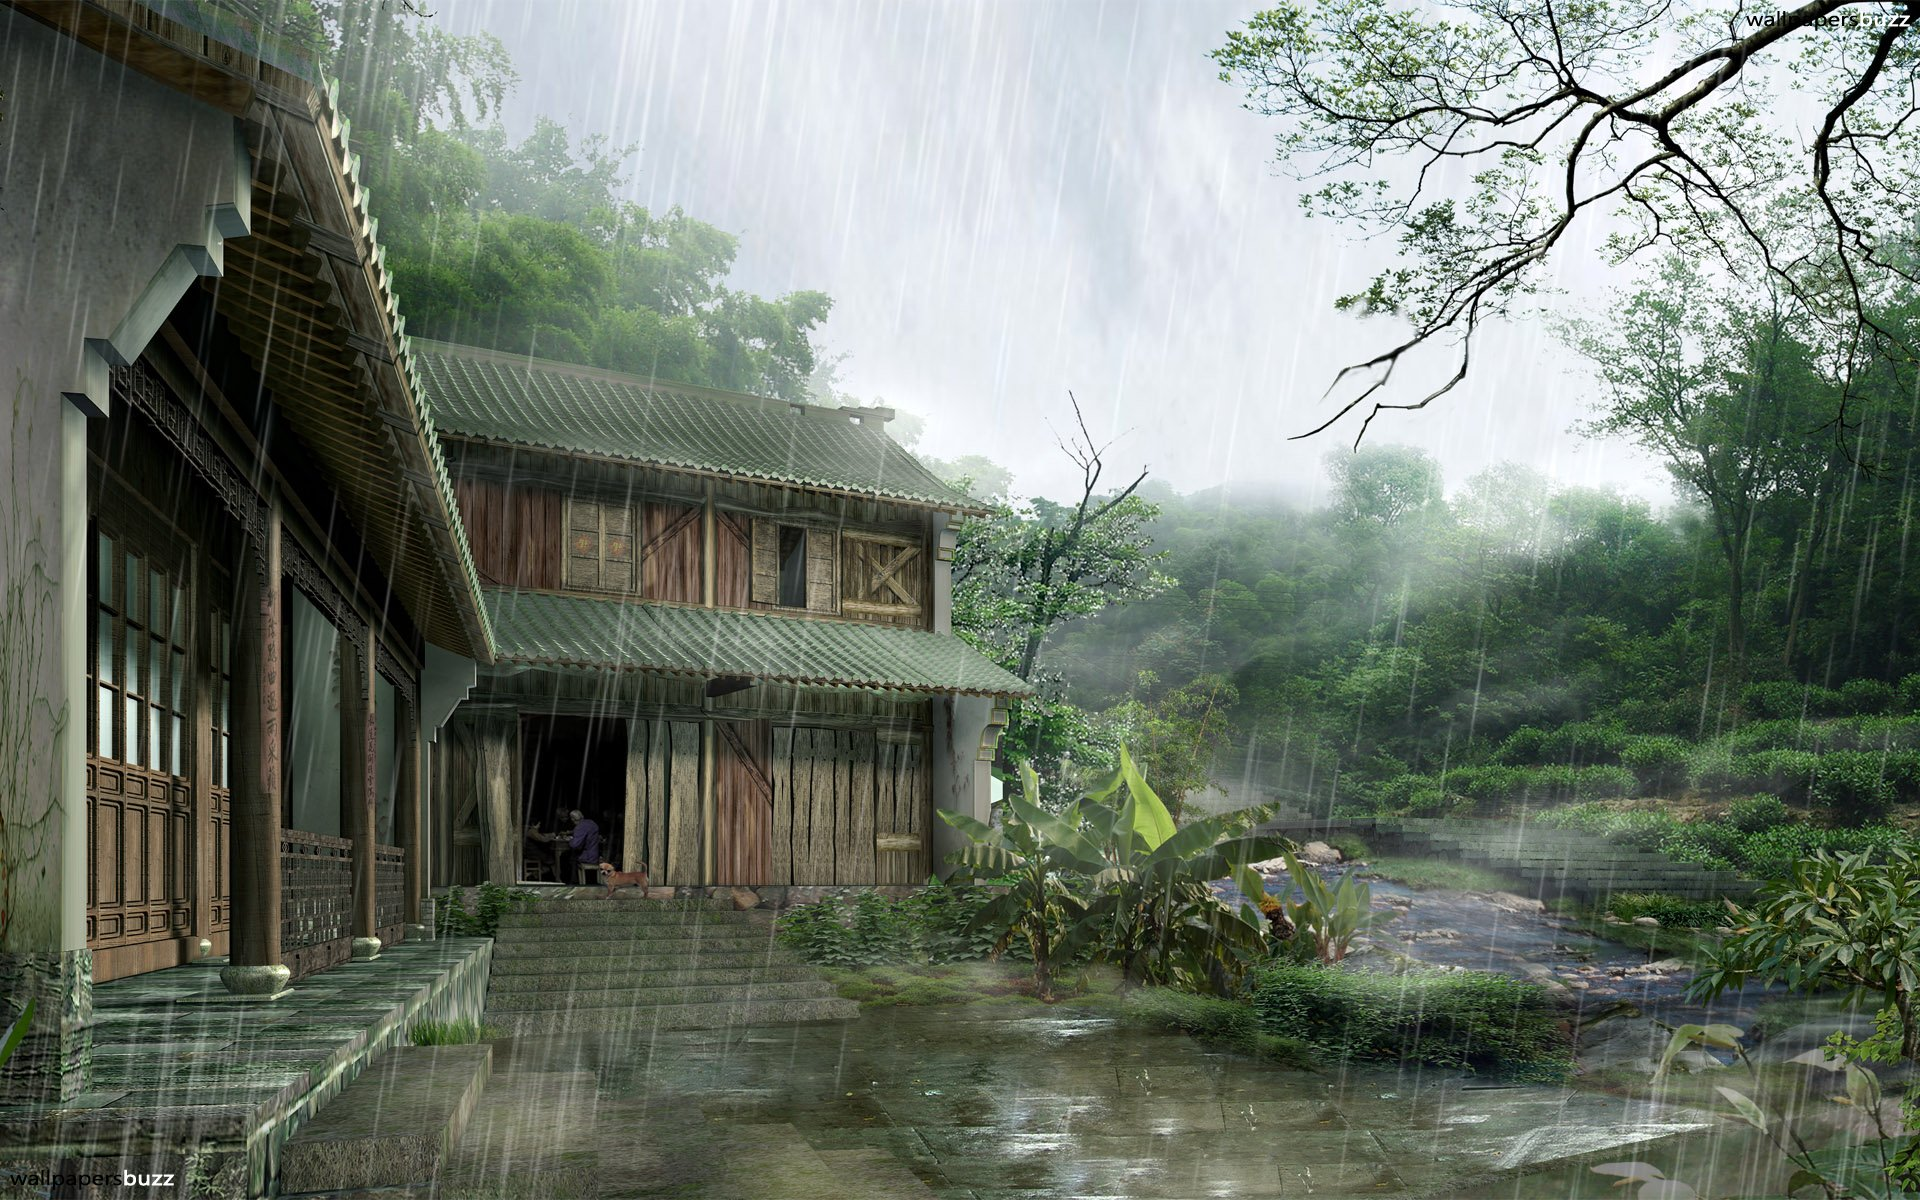 Rain Wallpapers Desktop HD Wallpapers Pictures Images 1920x1200